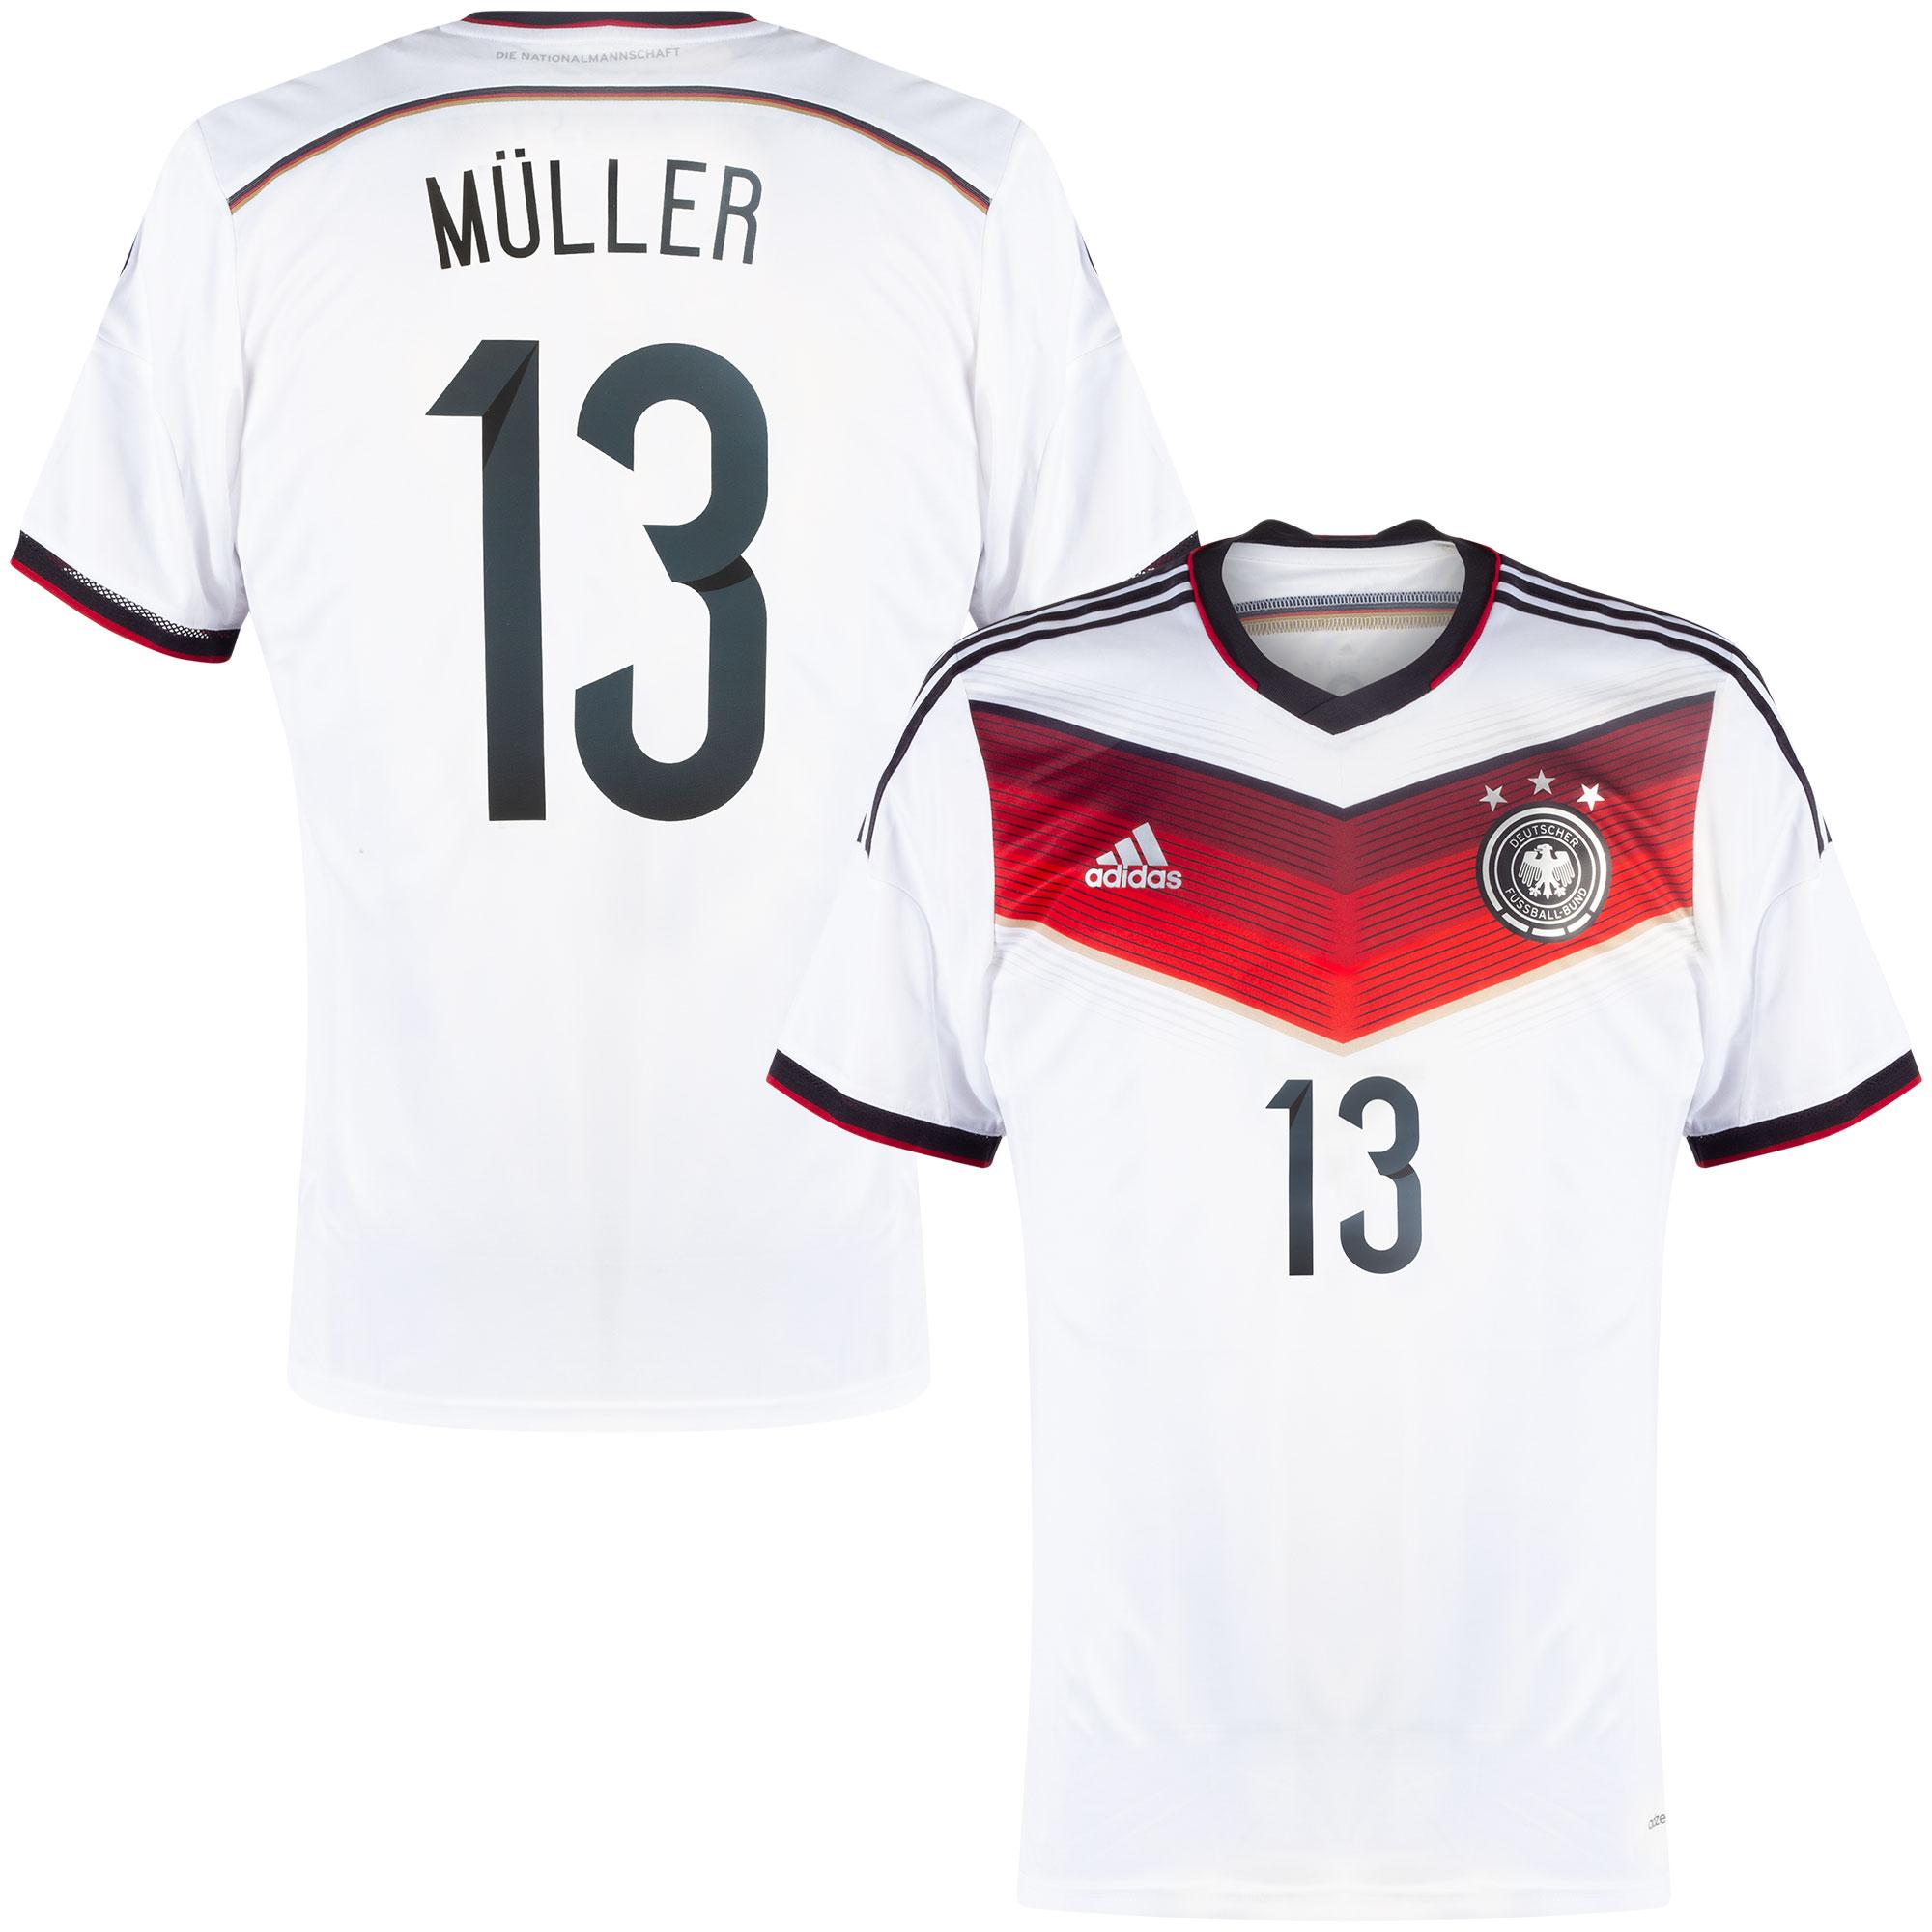 Retro Germany Shirt